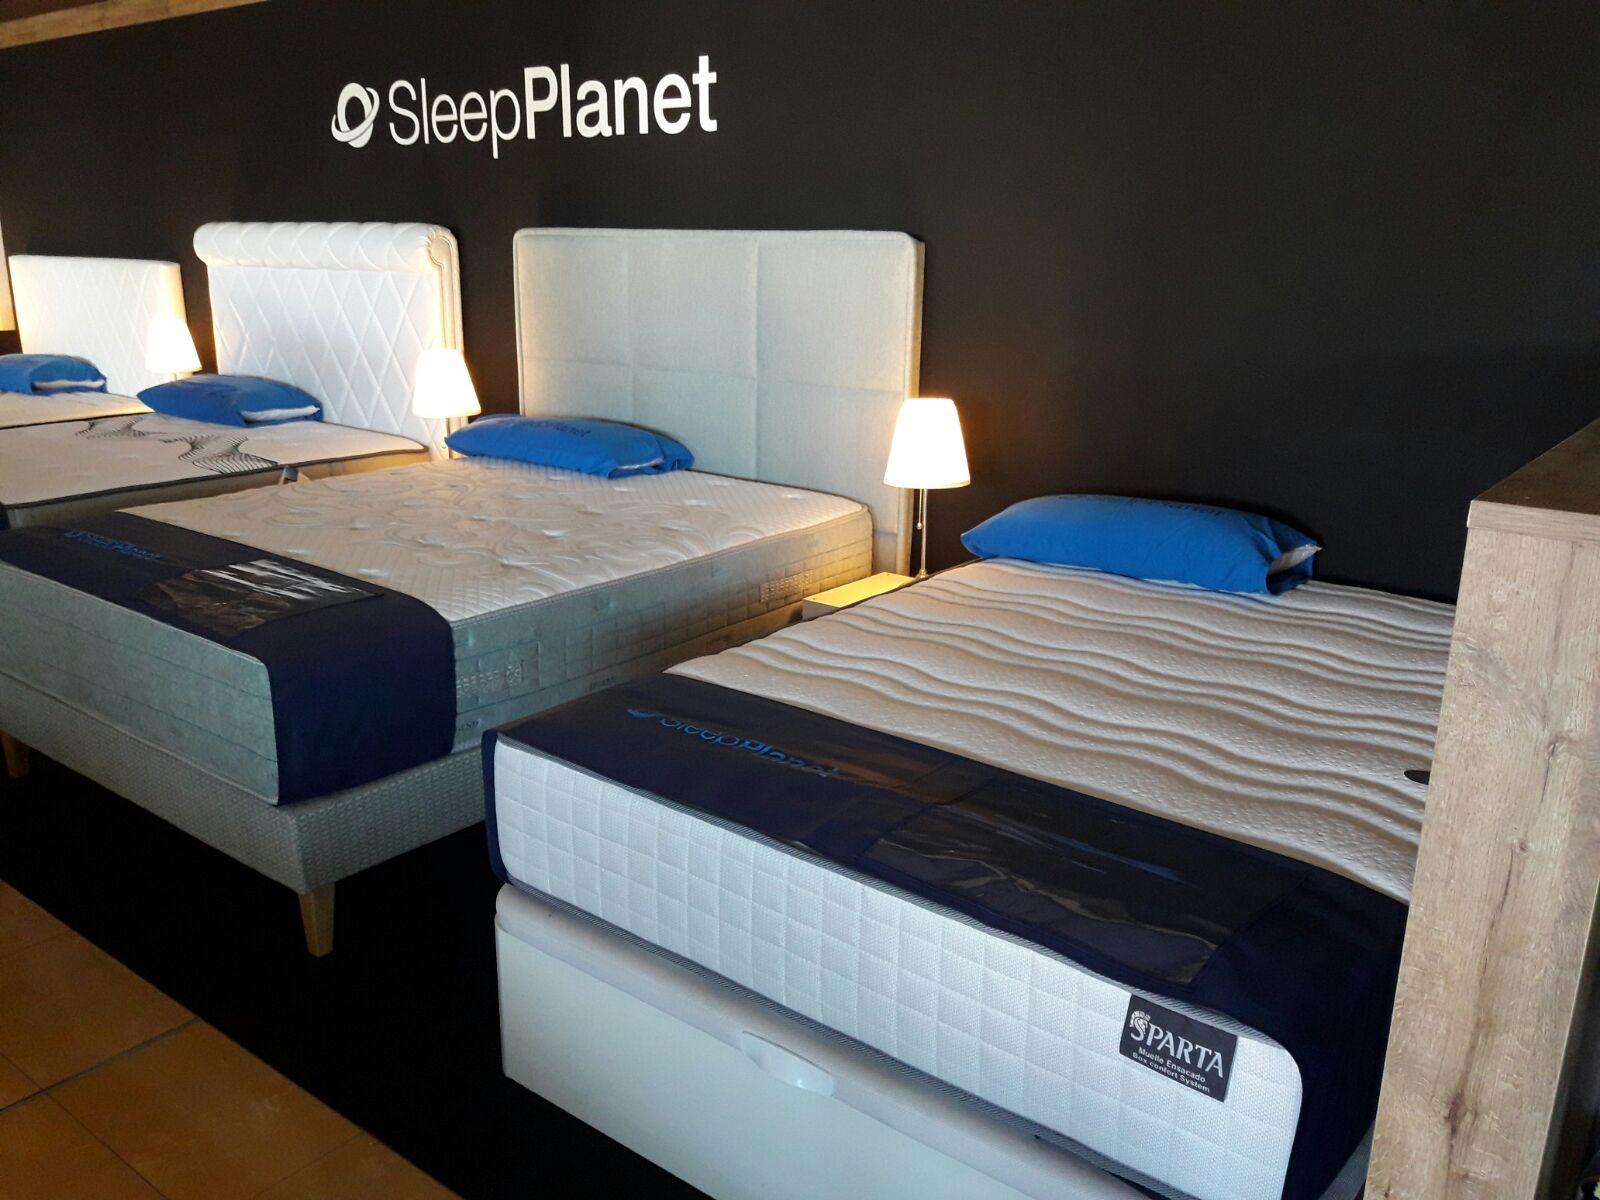 Nueva Tienda Sleep Planet En M Rida Colchones Sleep Planet # Muebles Goterris